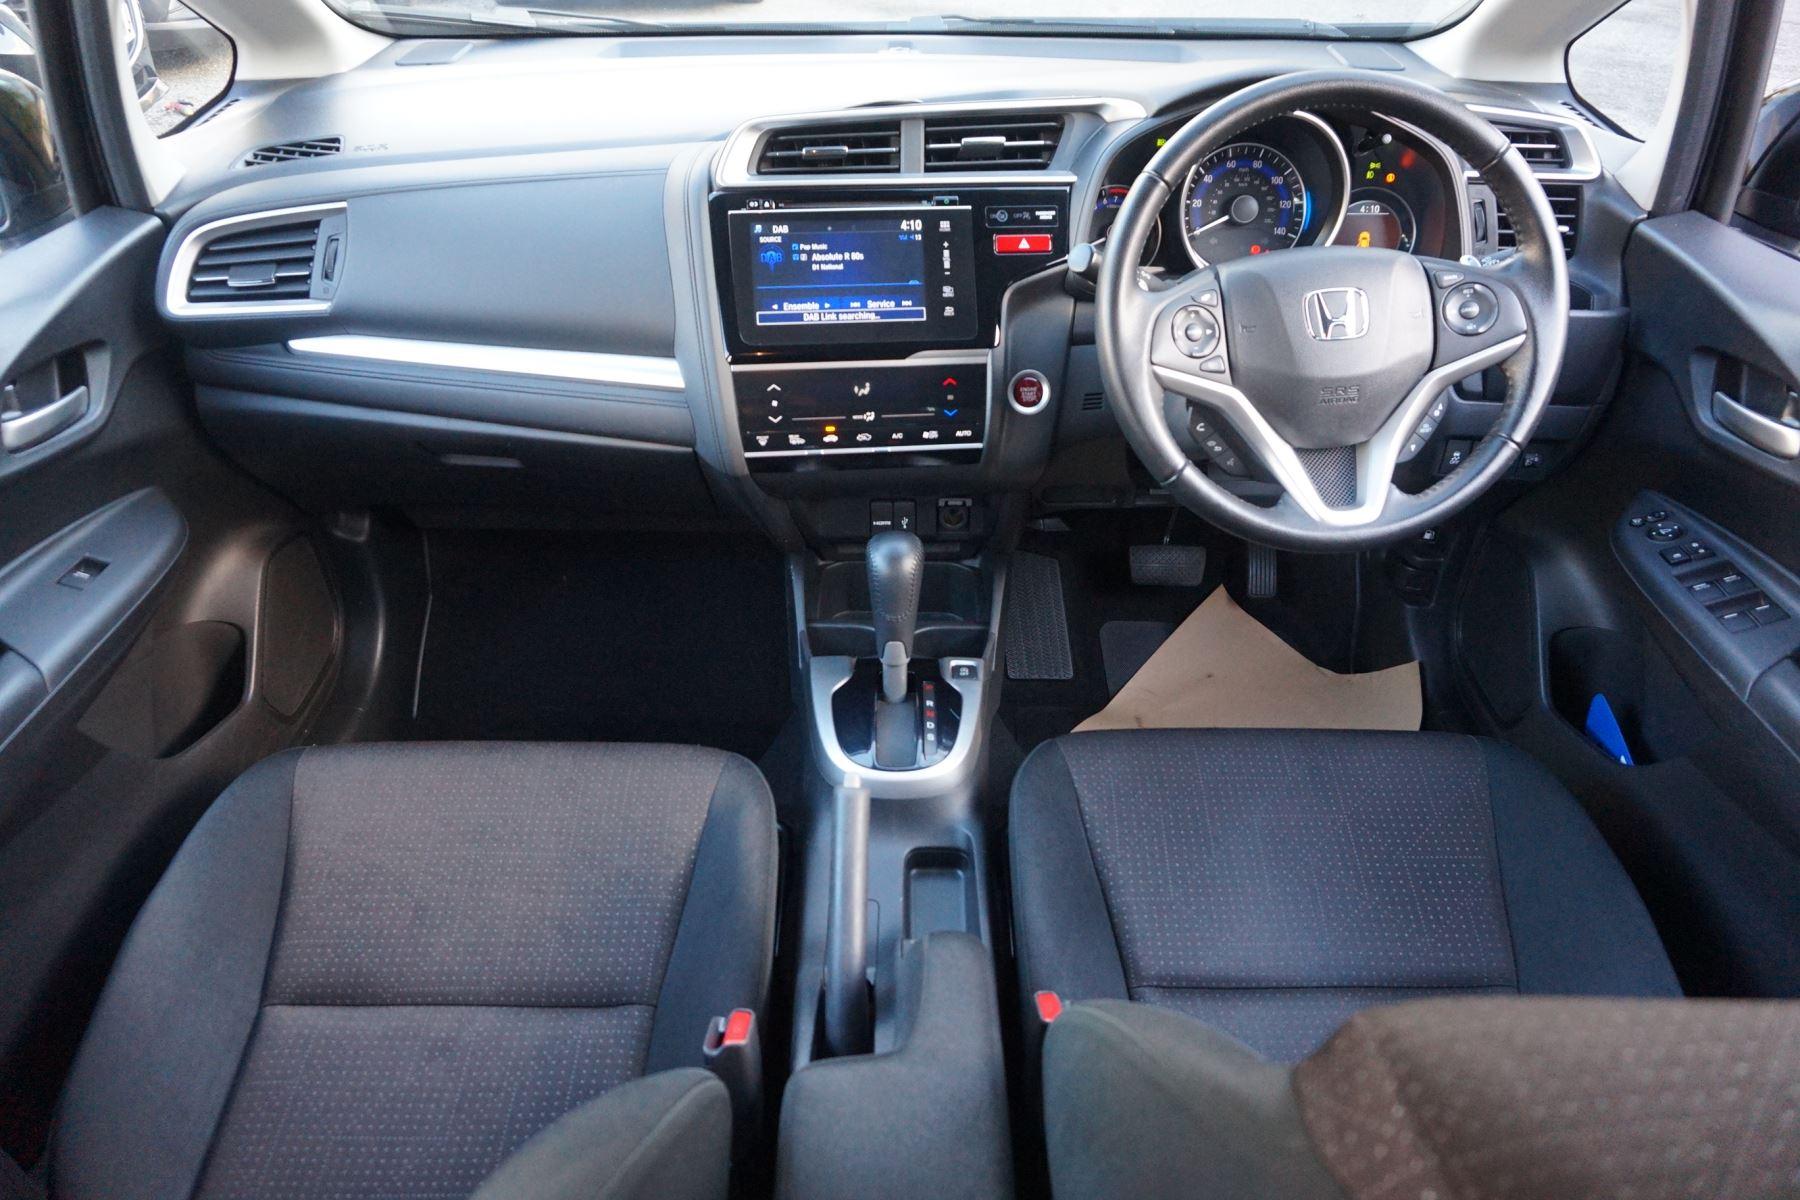 Honda Jazz 1.3 EX CVT image 19